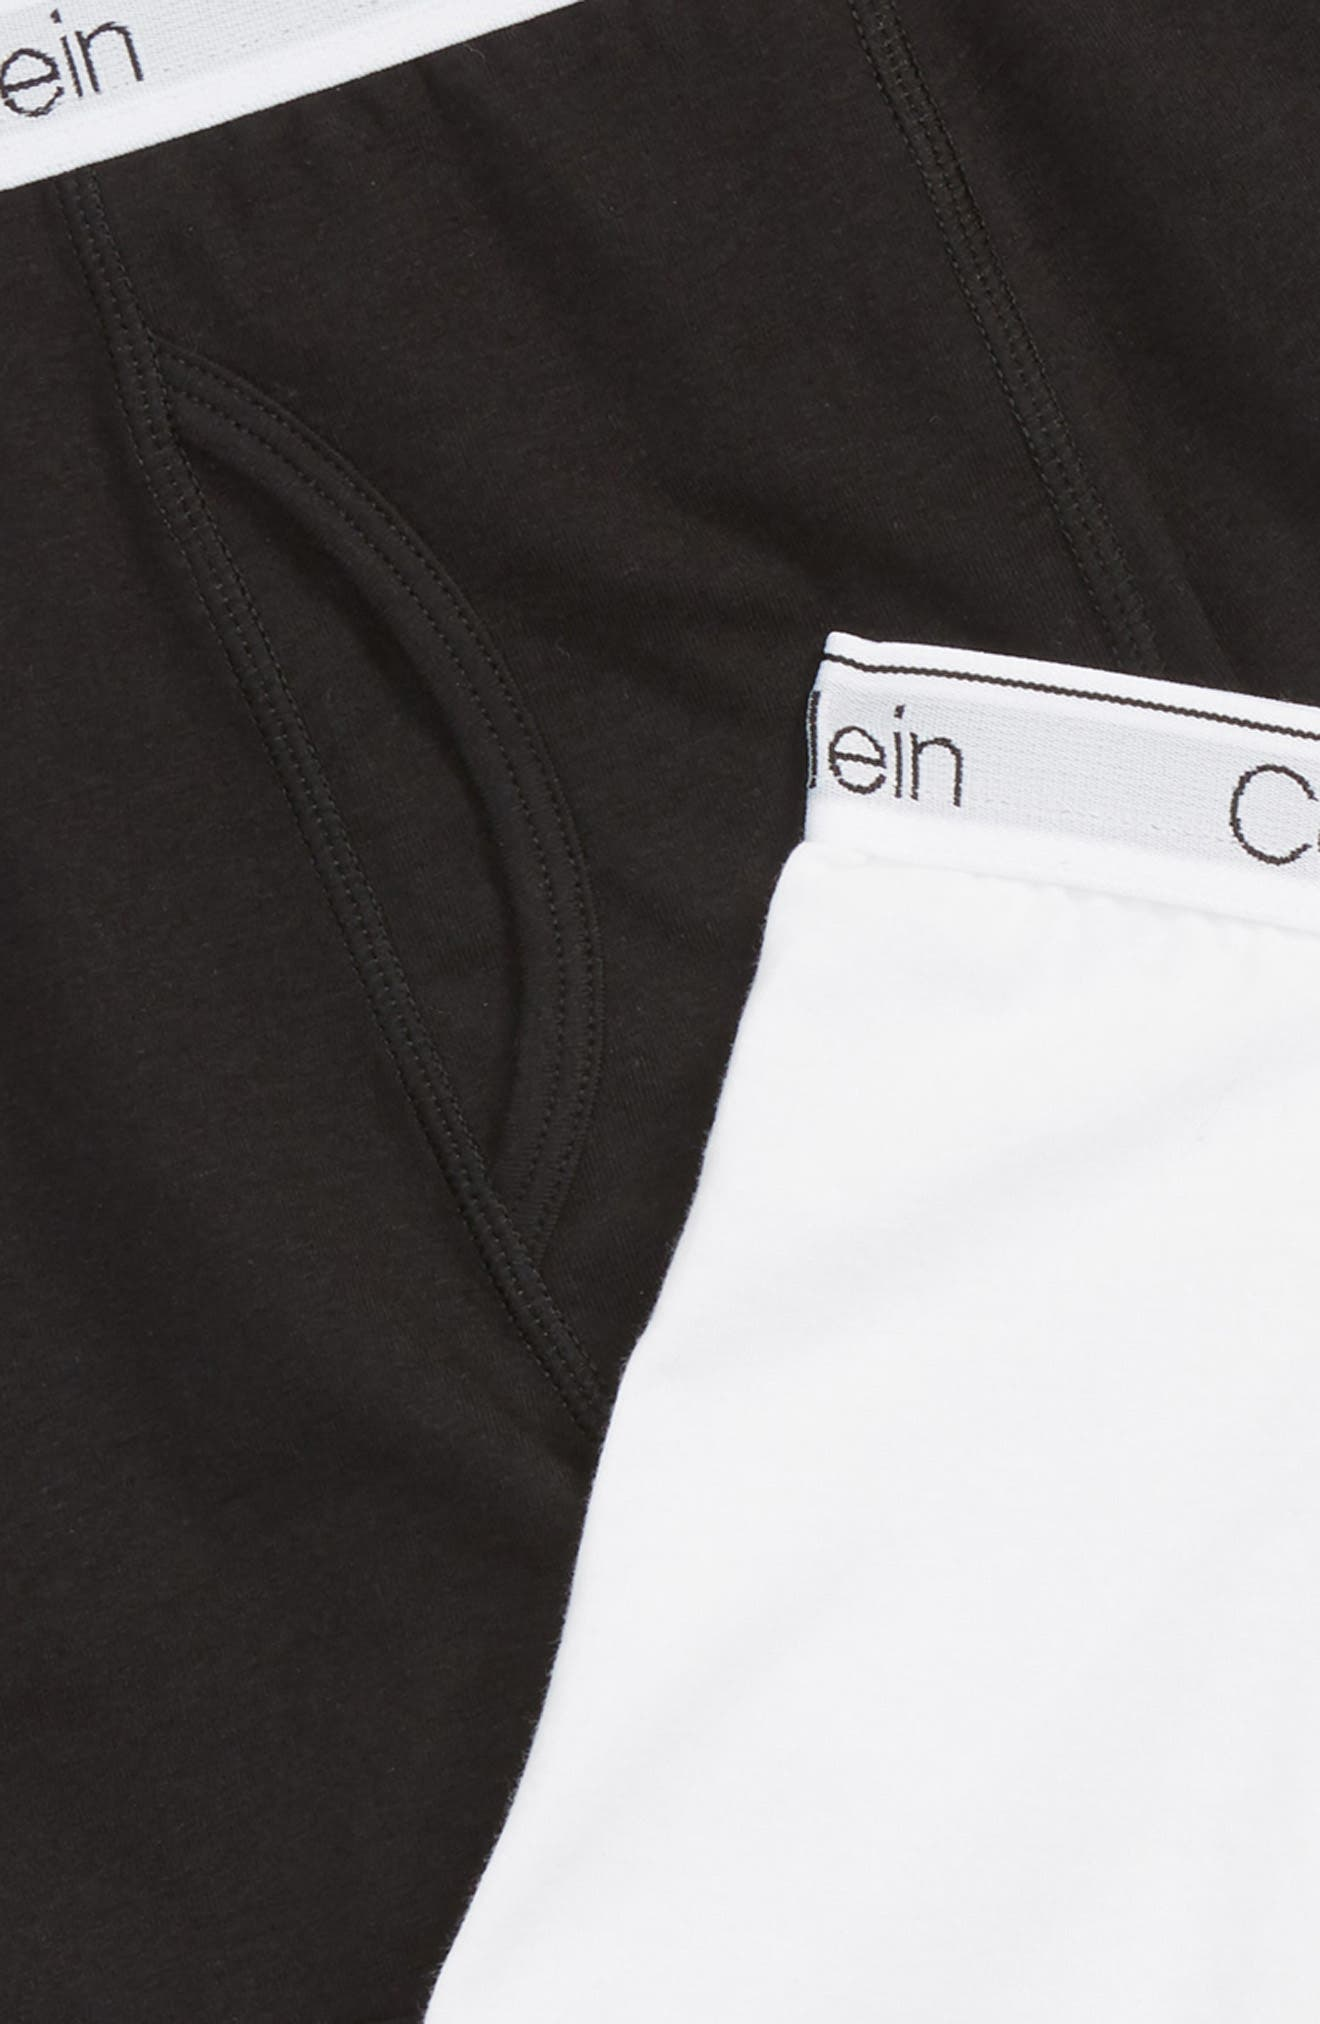 2-Pack Modern Boxer Briefs,                             Alternate thumbnail 2, color,                             BLACK/CLASSIC WHITE